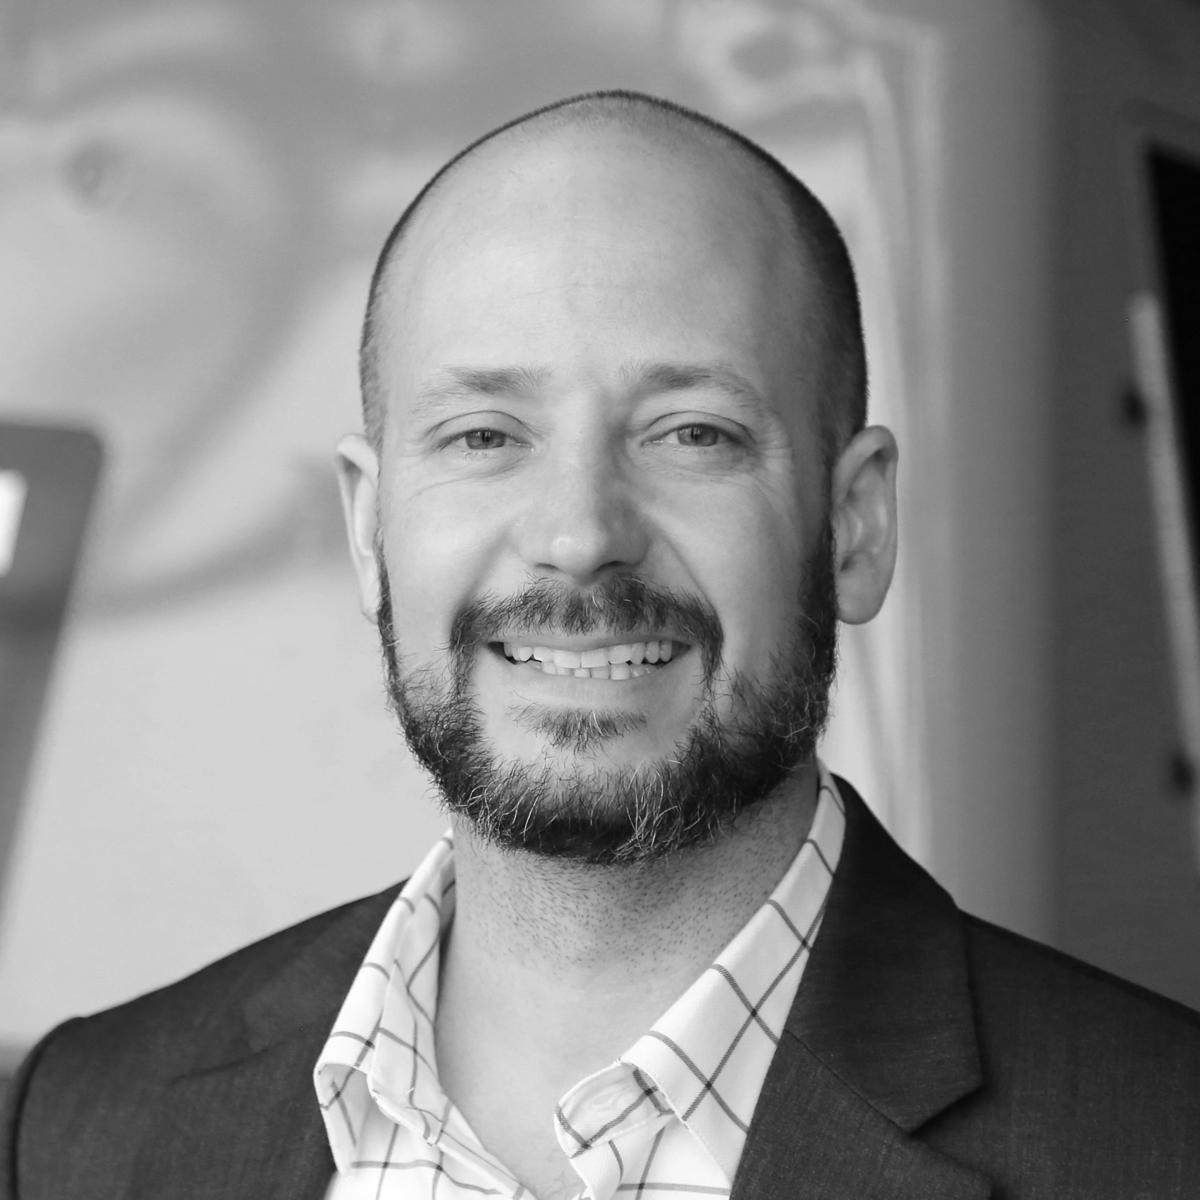 Shae Birkey, Industry Account Manager; Caterpillar Inc.